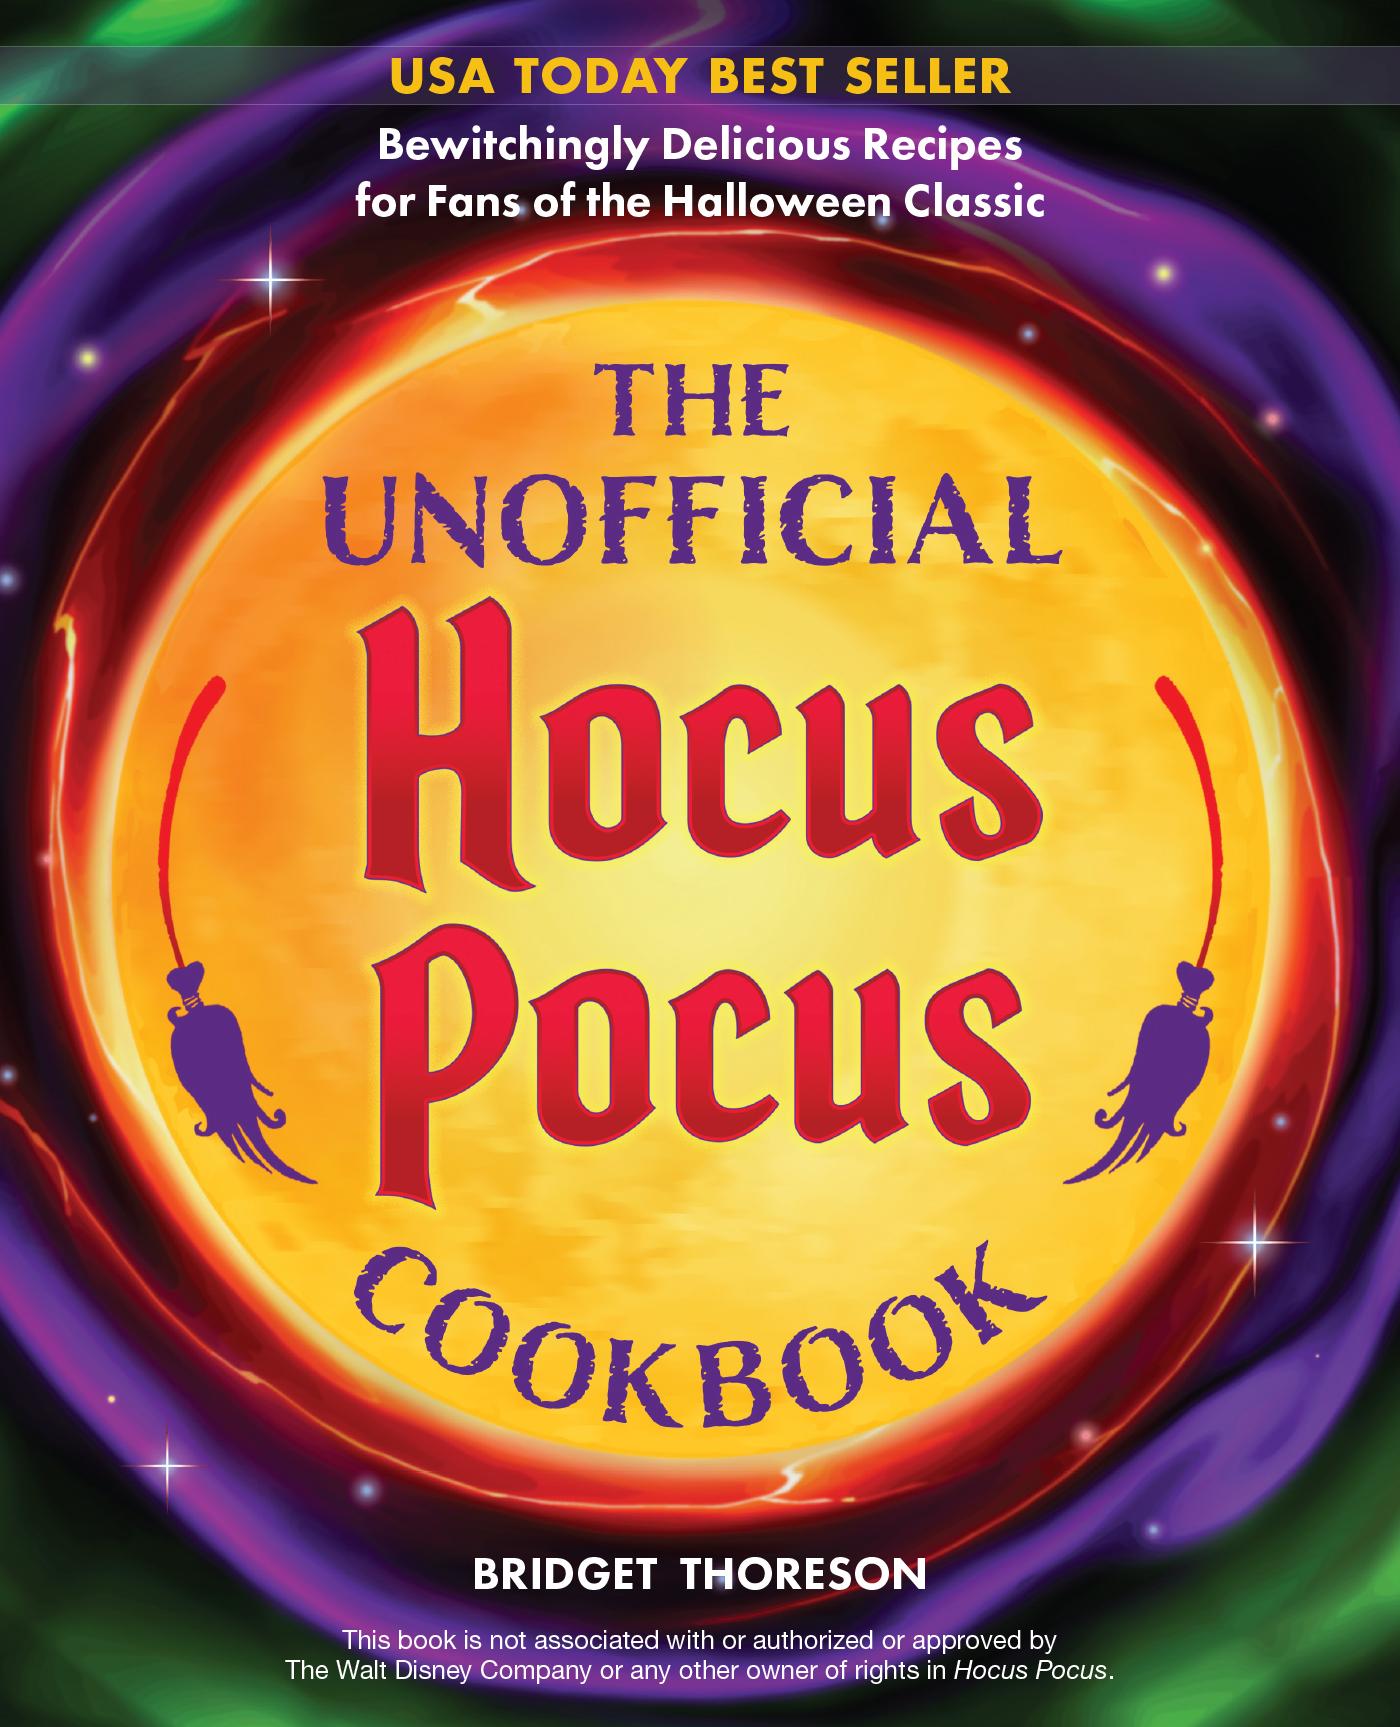 Unofficial Hocus Pocus Cookbook-front.indd